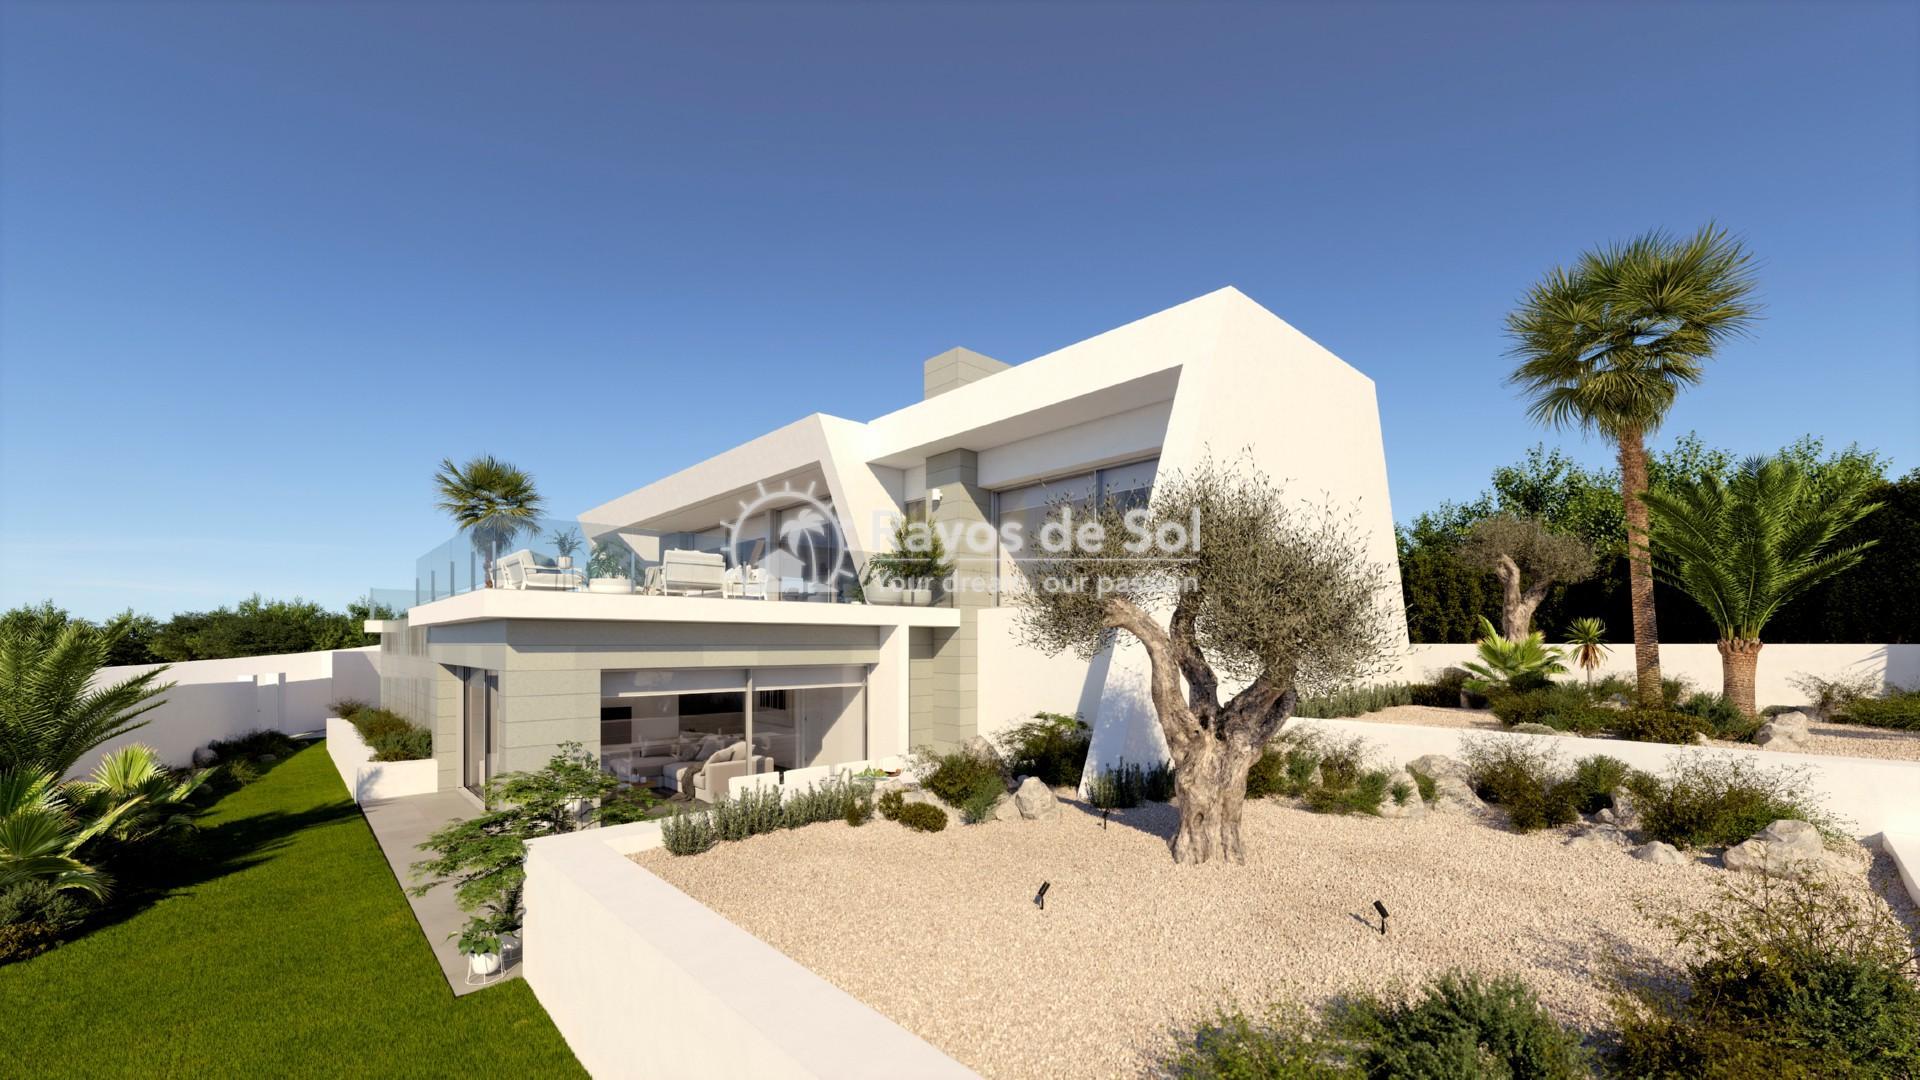 Villa with stunning views in Cumbre del Sol, Benitachell, Costa Blanca (BEVALIDIT) - 5